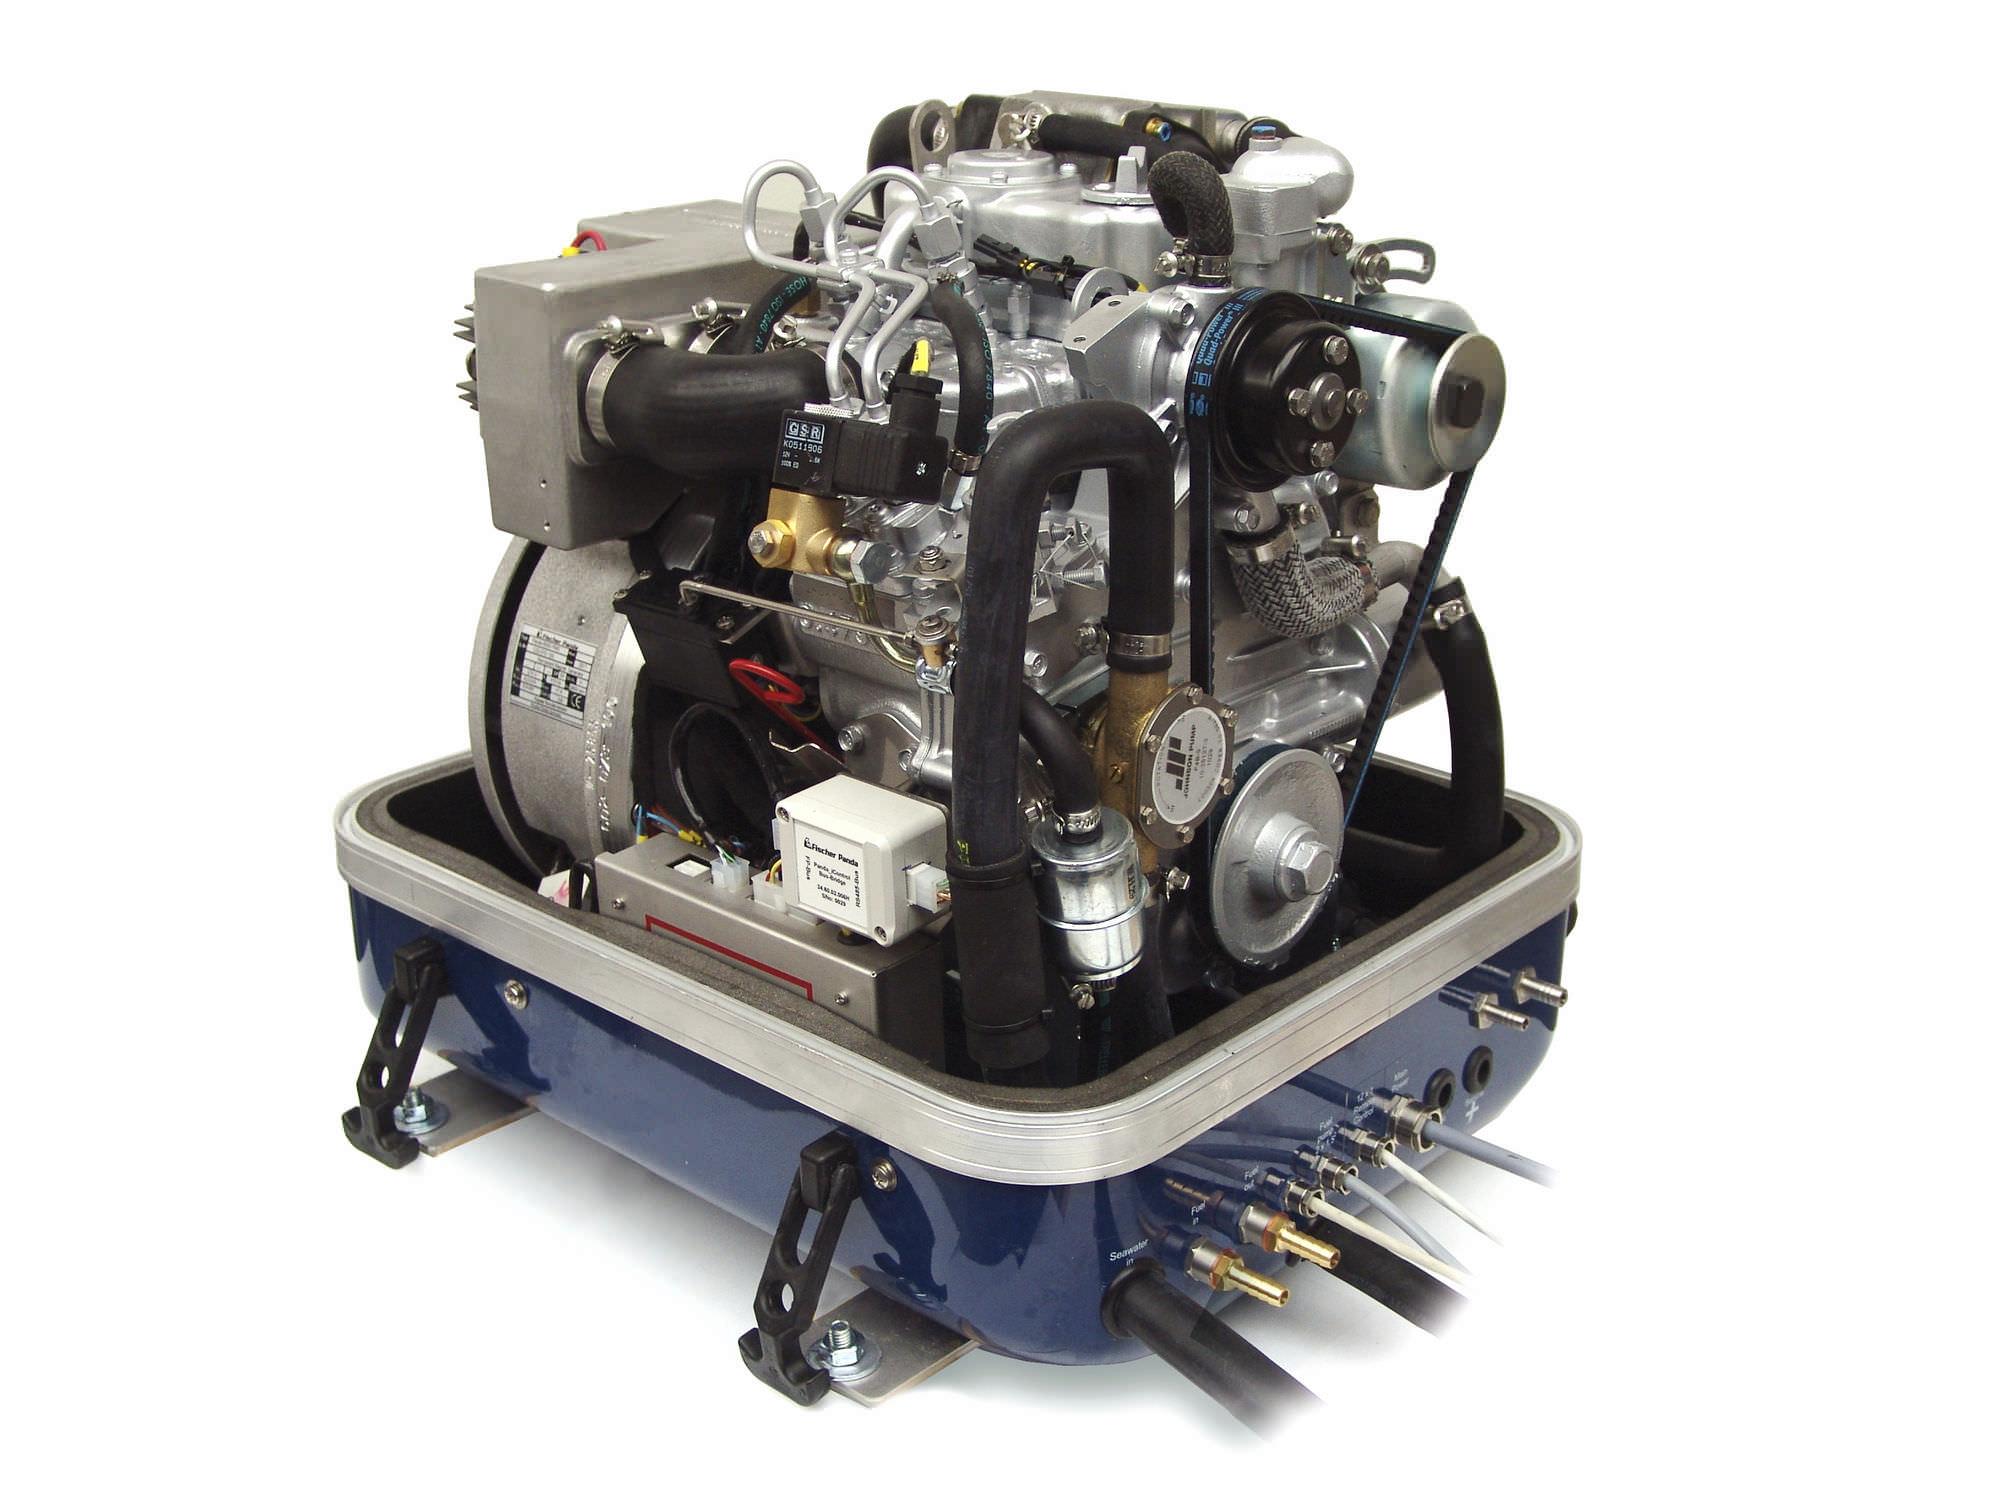 Boat generator set sel PANDA 8000i PMS Fischer Panda